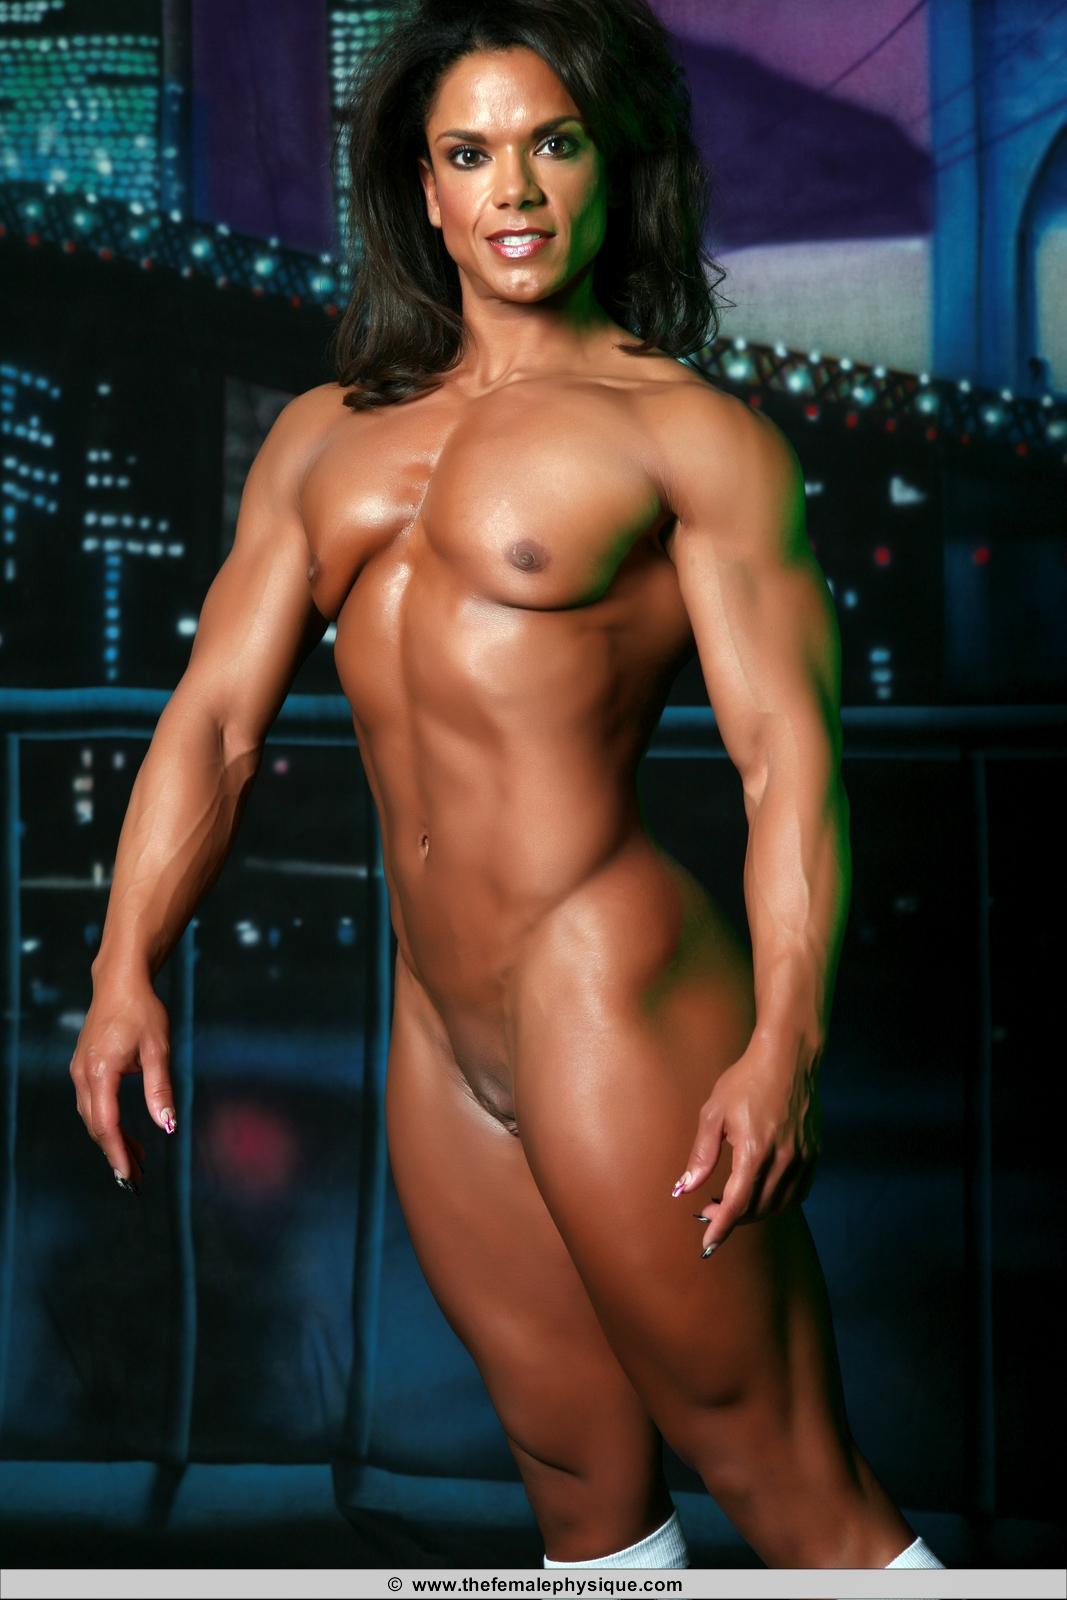 Fitness Model Female Nude